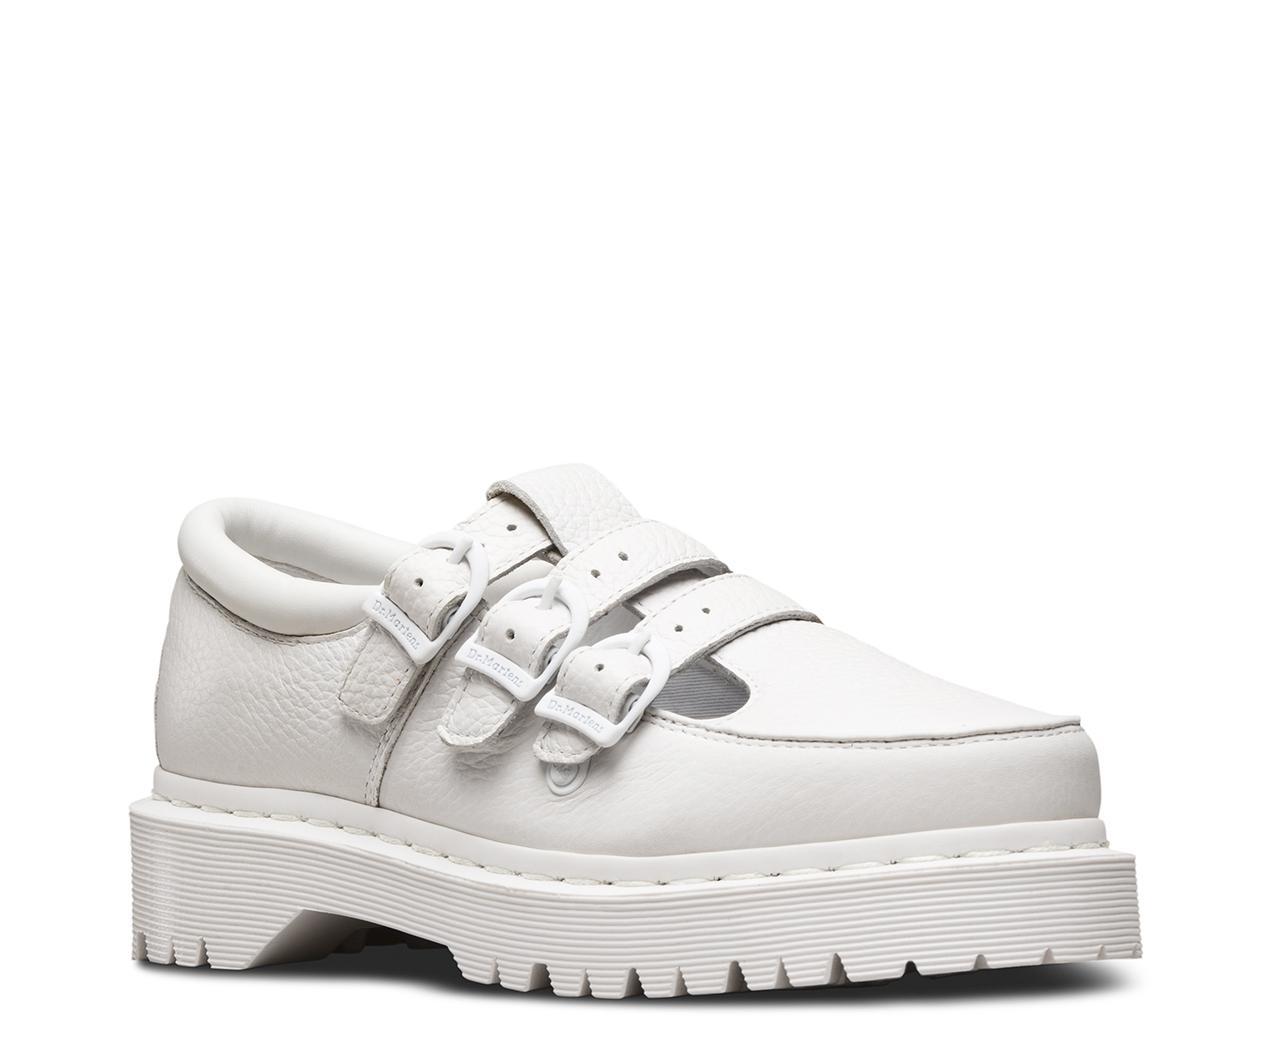 Dr.Martens Womens Freya Aunt Sally Black Leather Shoes 41 EU cZjBnv1wE